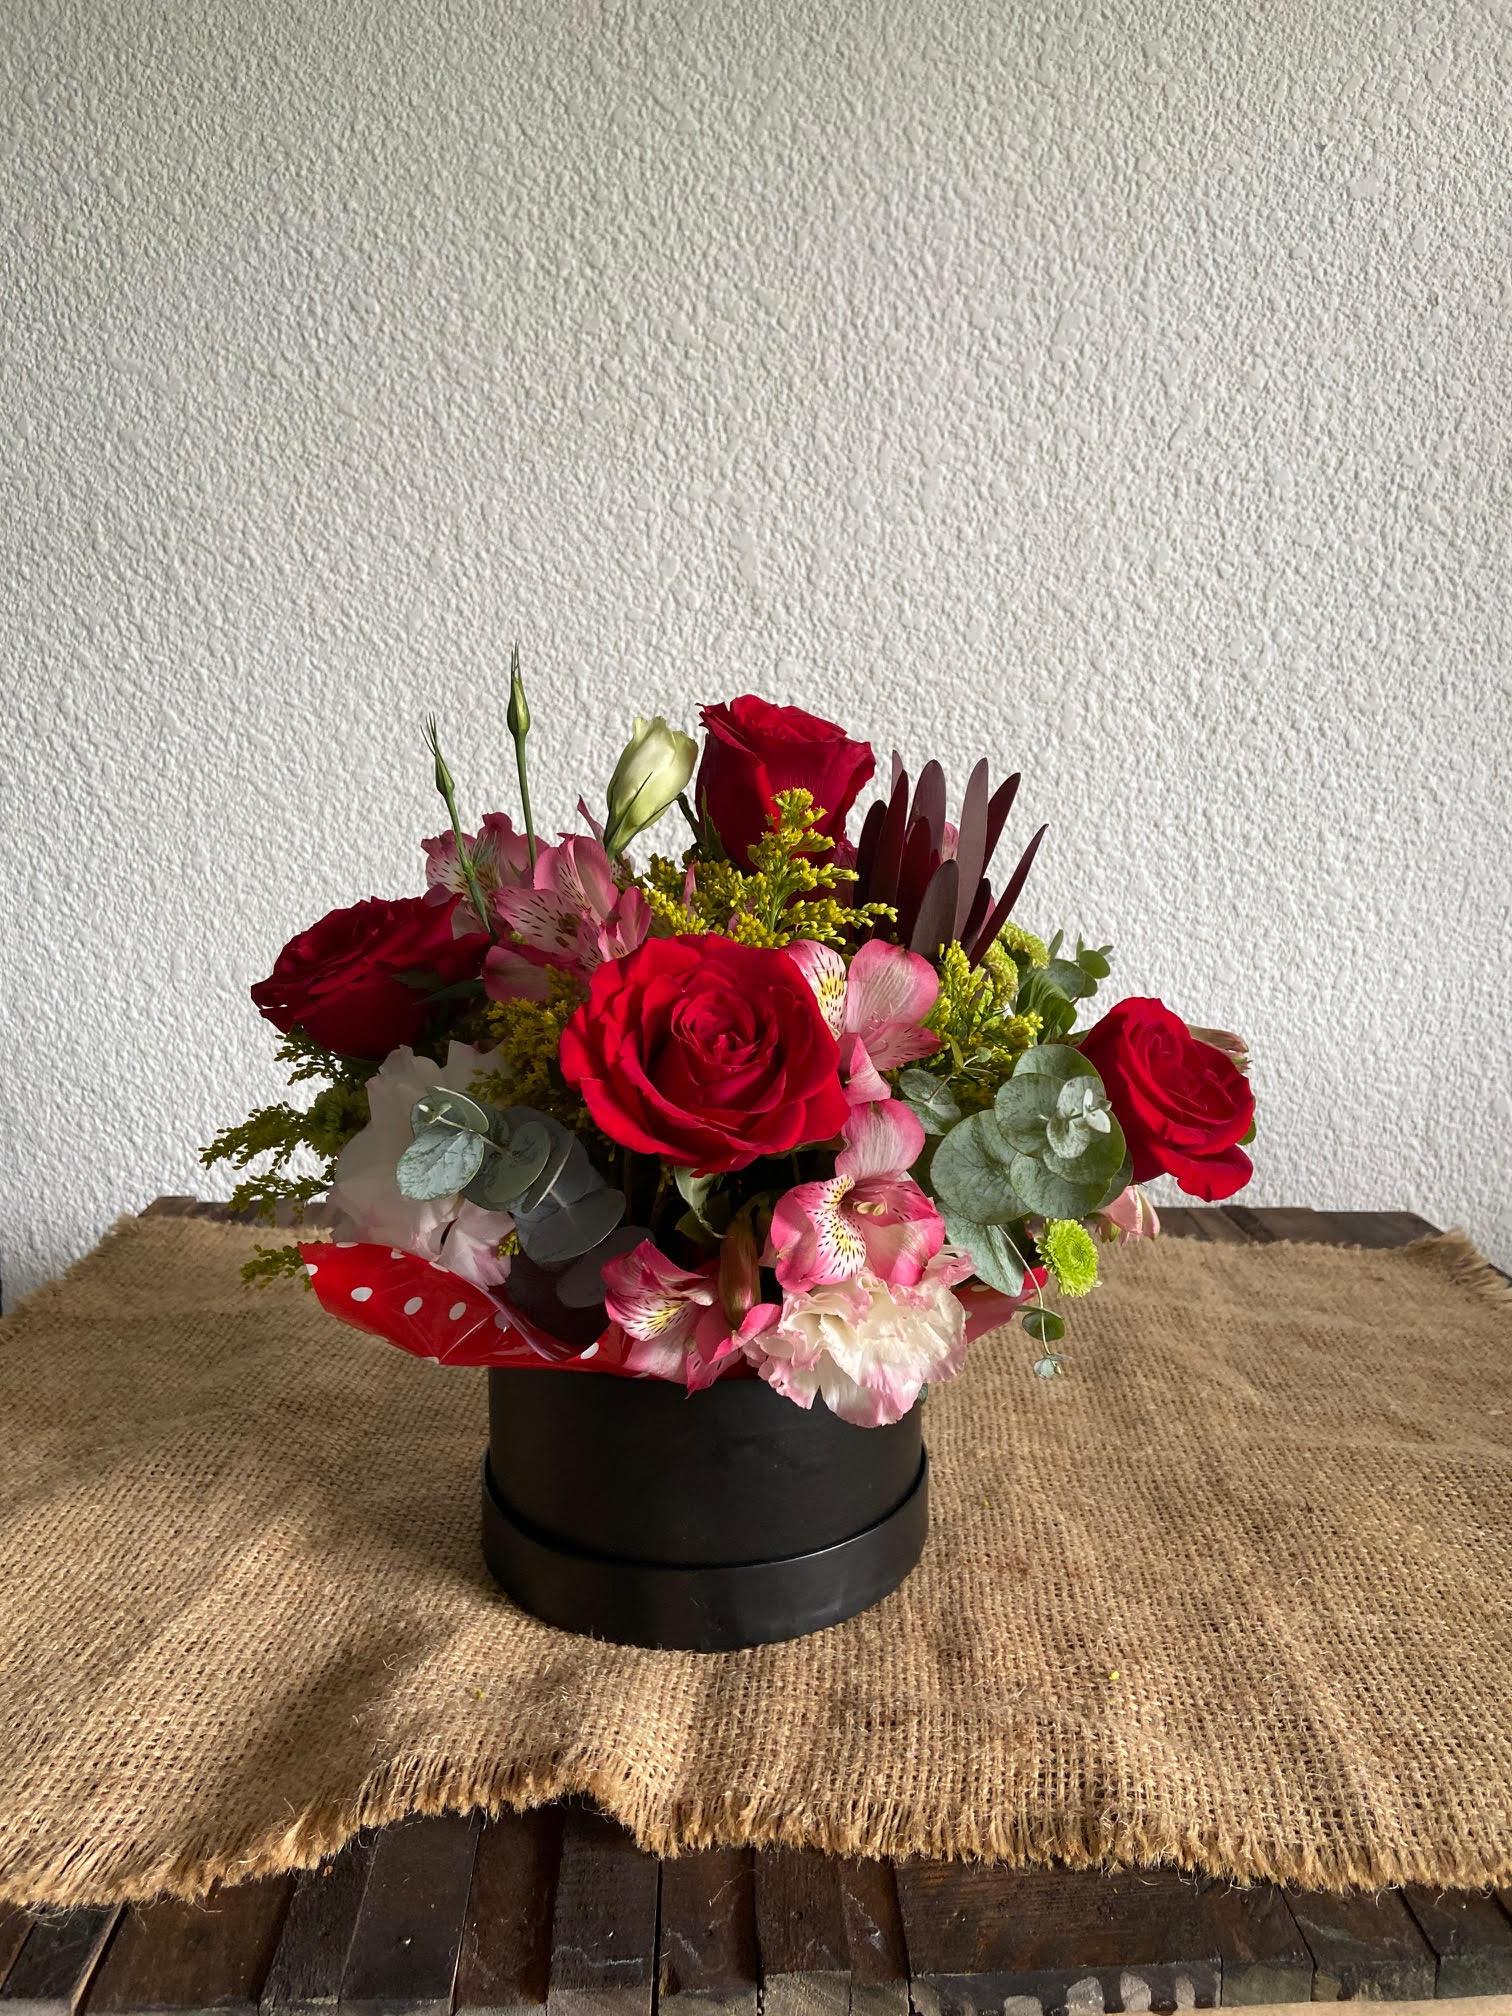 023 Caja de flores variadas, pequeña Image